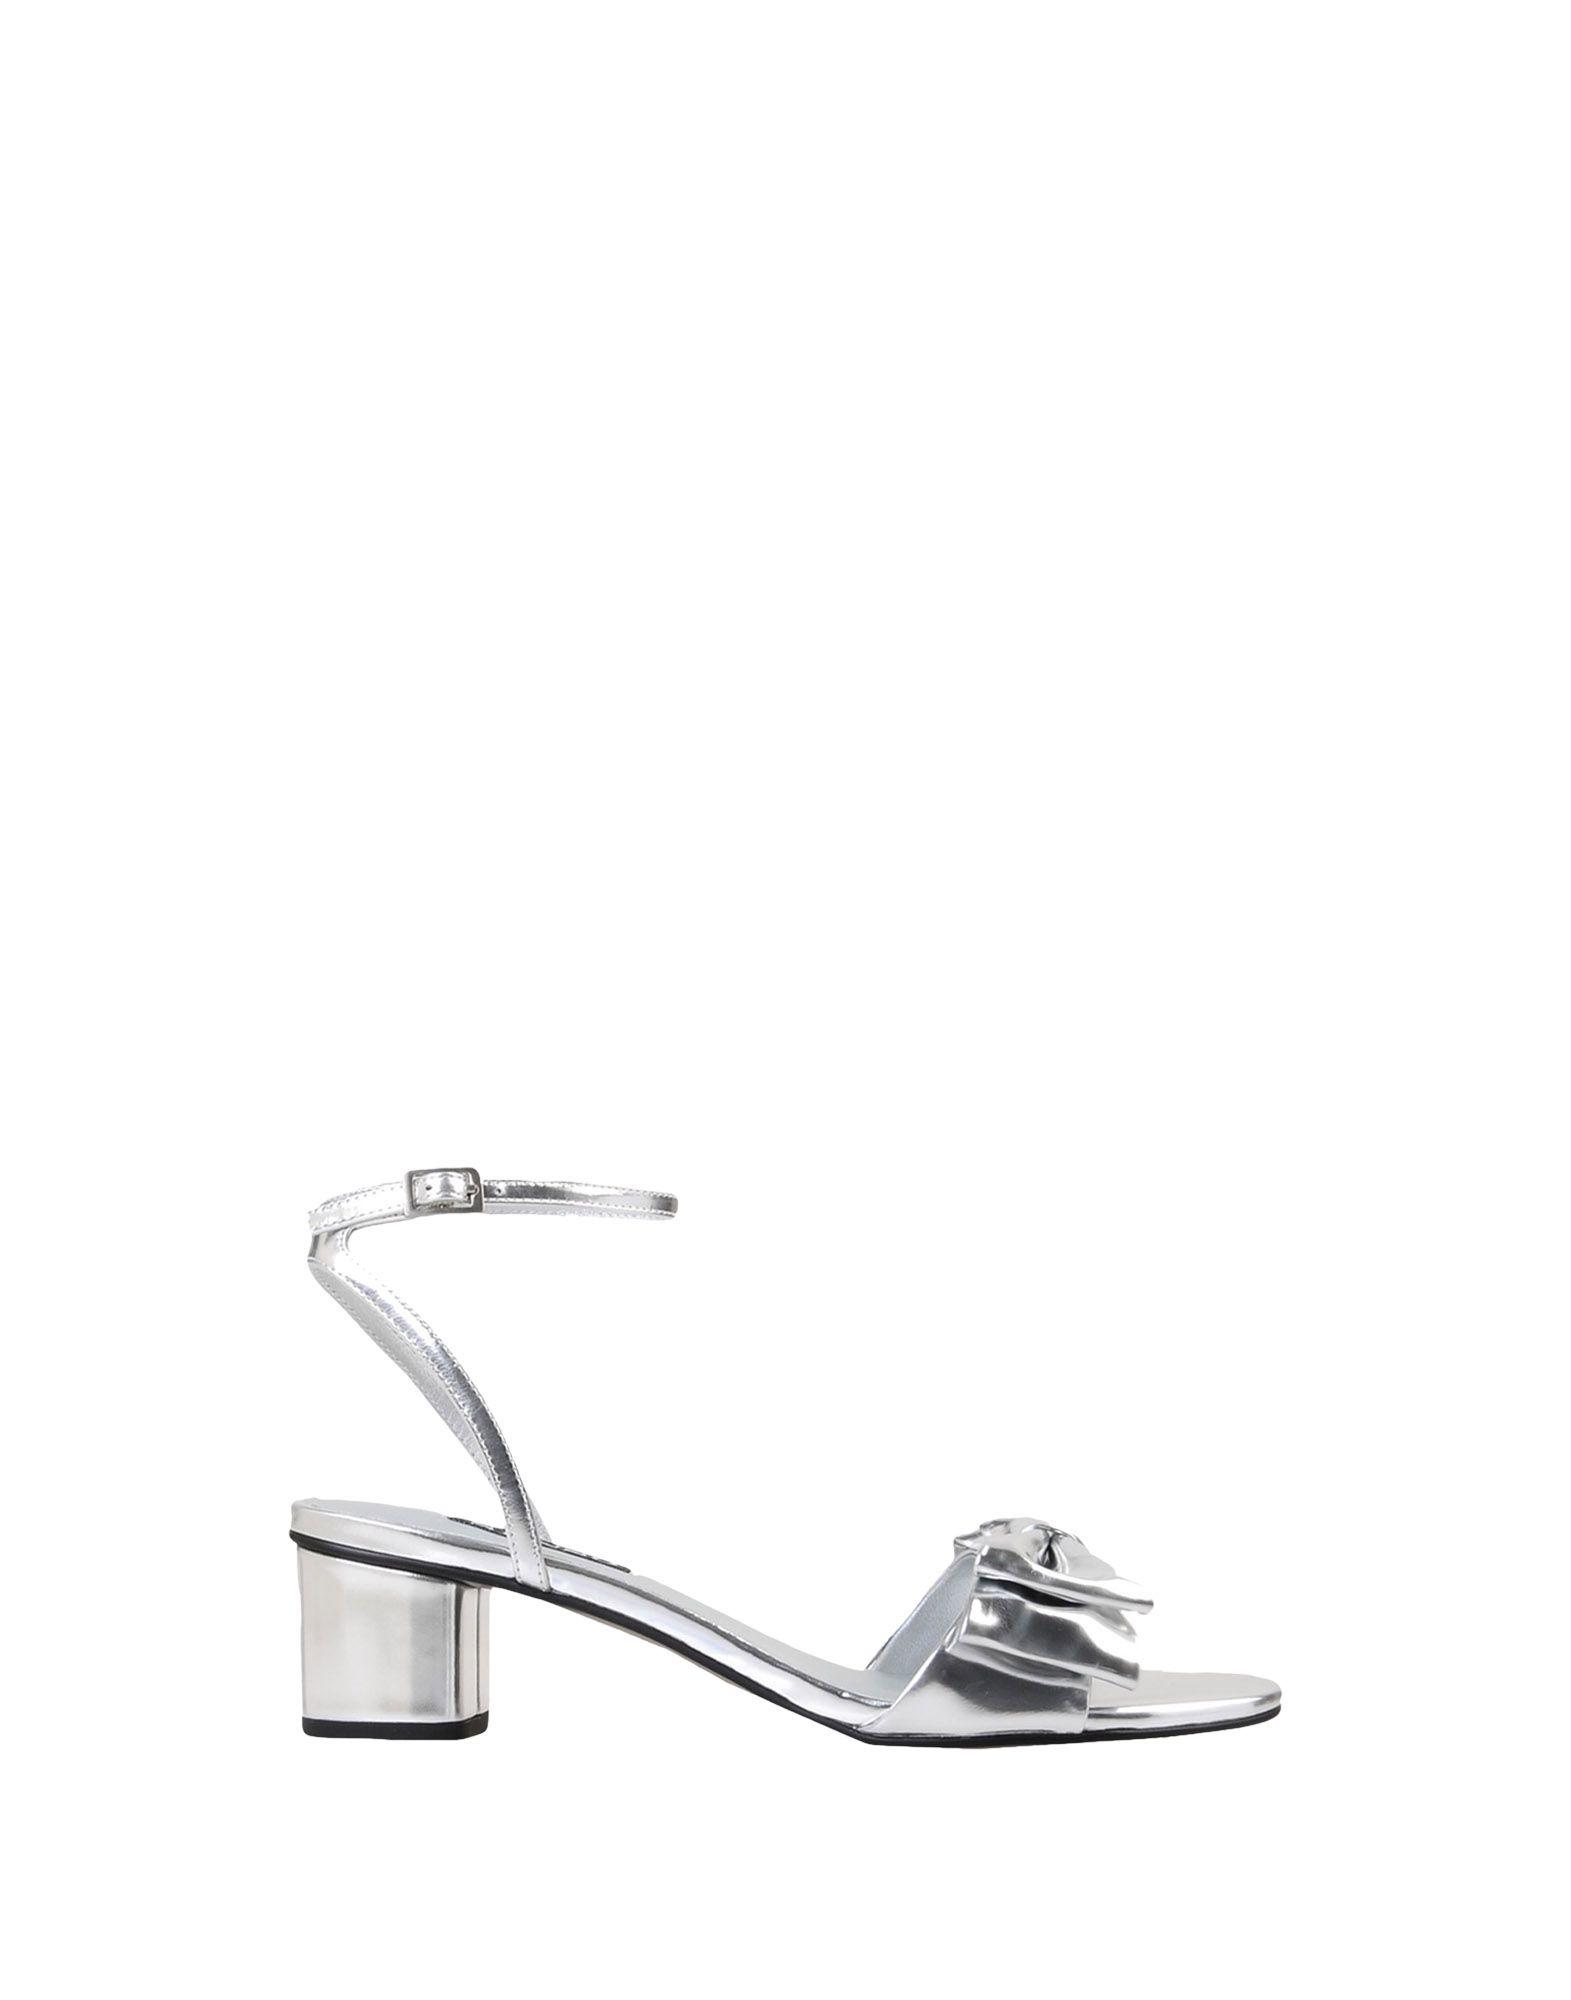 Stilvolle 11457607ST billige Schuhe Senso Jemma 11457607ST Stilvolle bfbaaf